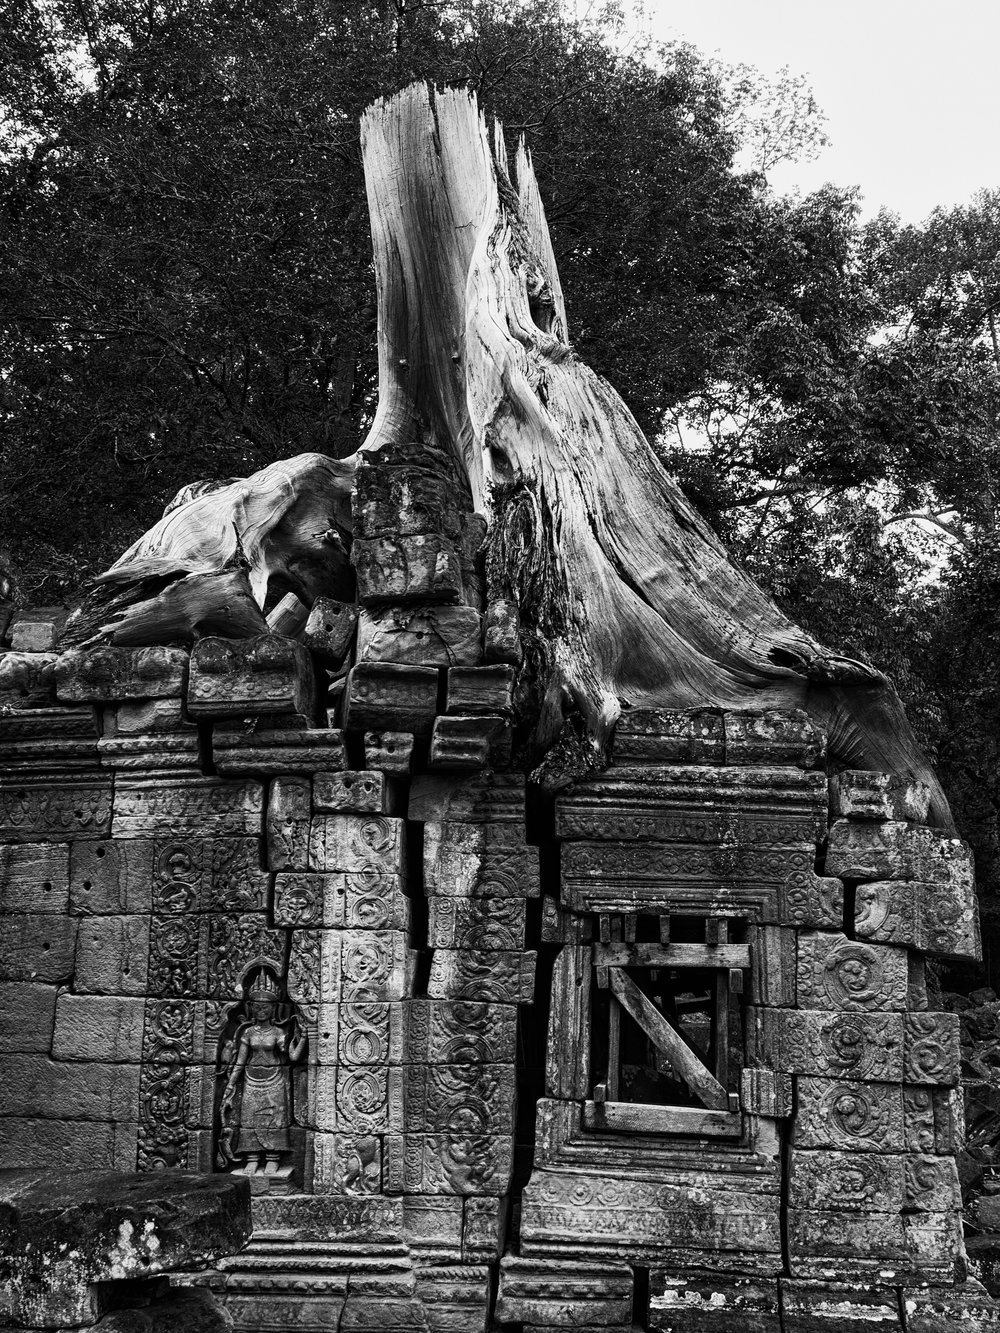 Musings by the Glass - Visual Musings - Tree Overgrown at Angkor Wat